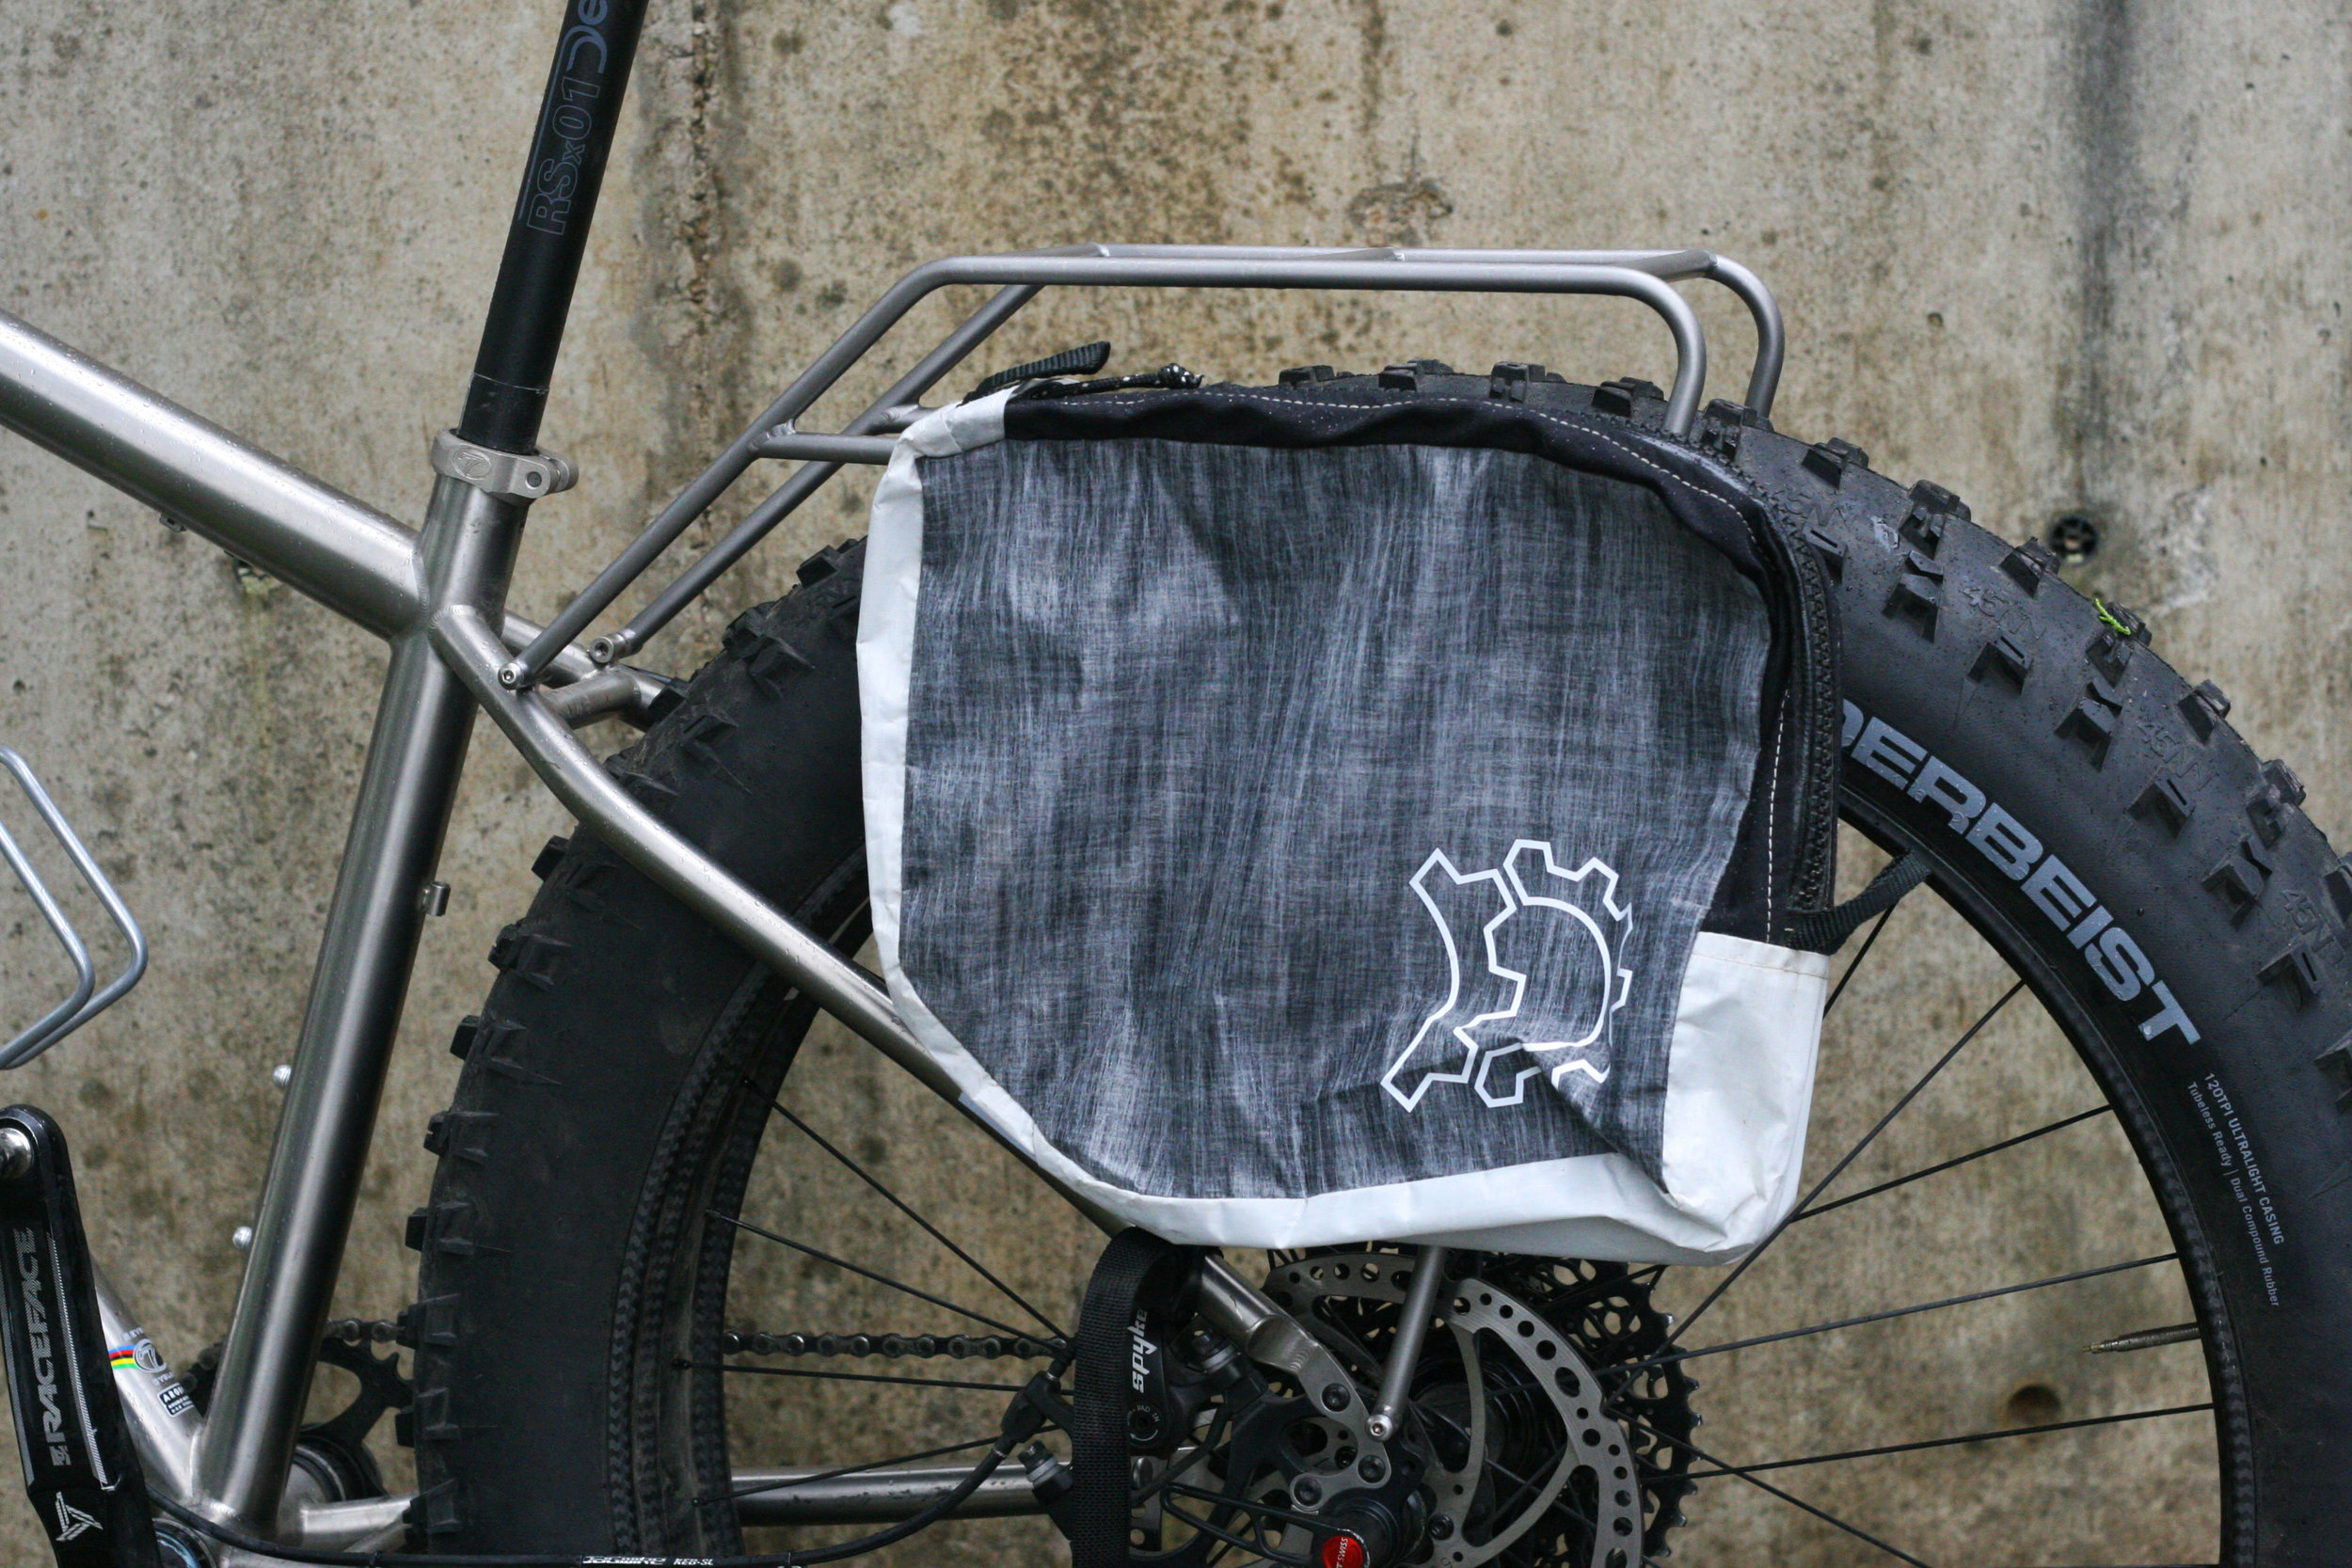 TCF-hardware-rack-rear-fatbike-titanium-Seven (9).JPG